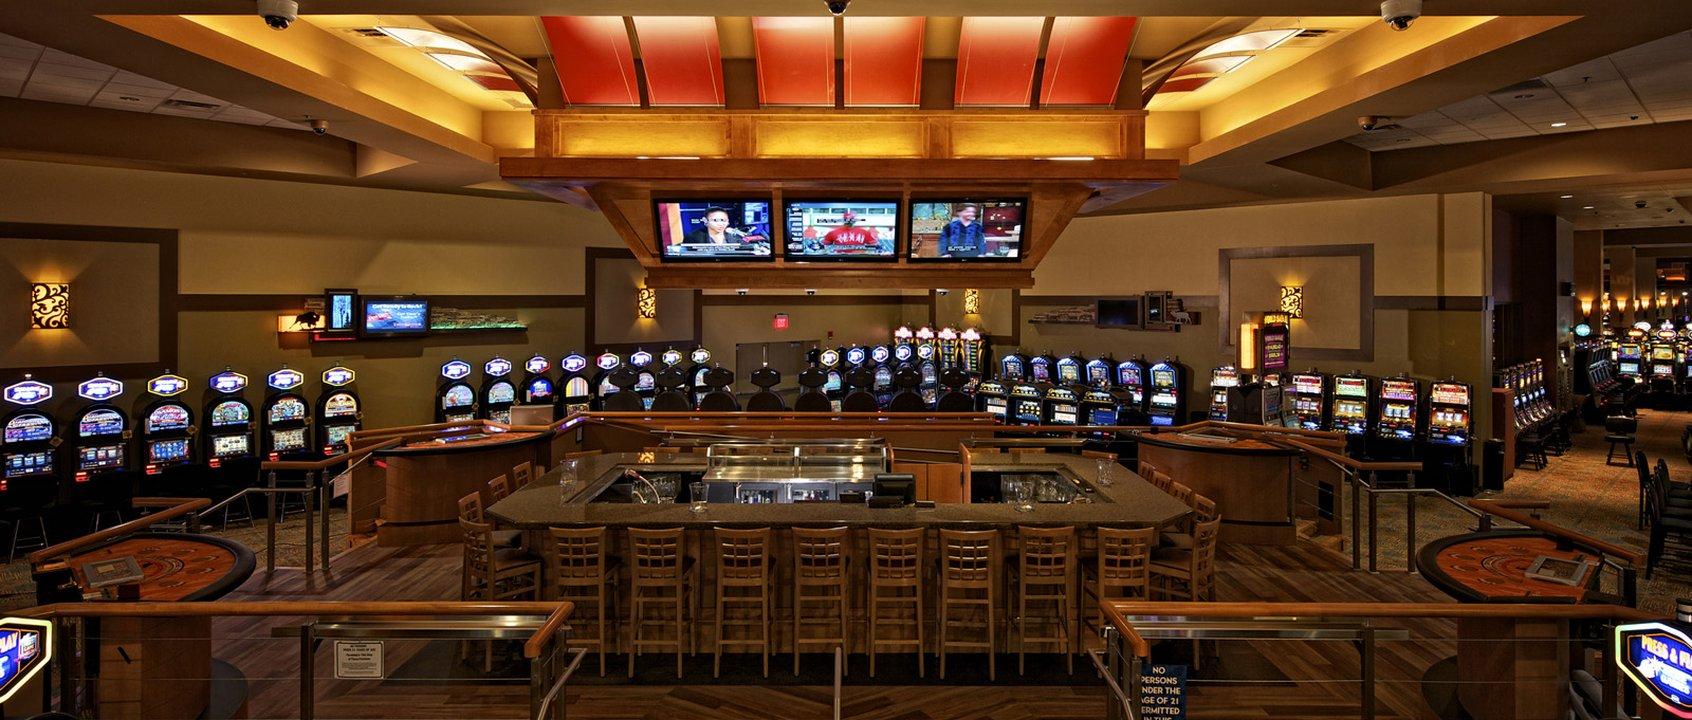 First council casino okla casino war in so cal